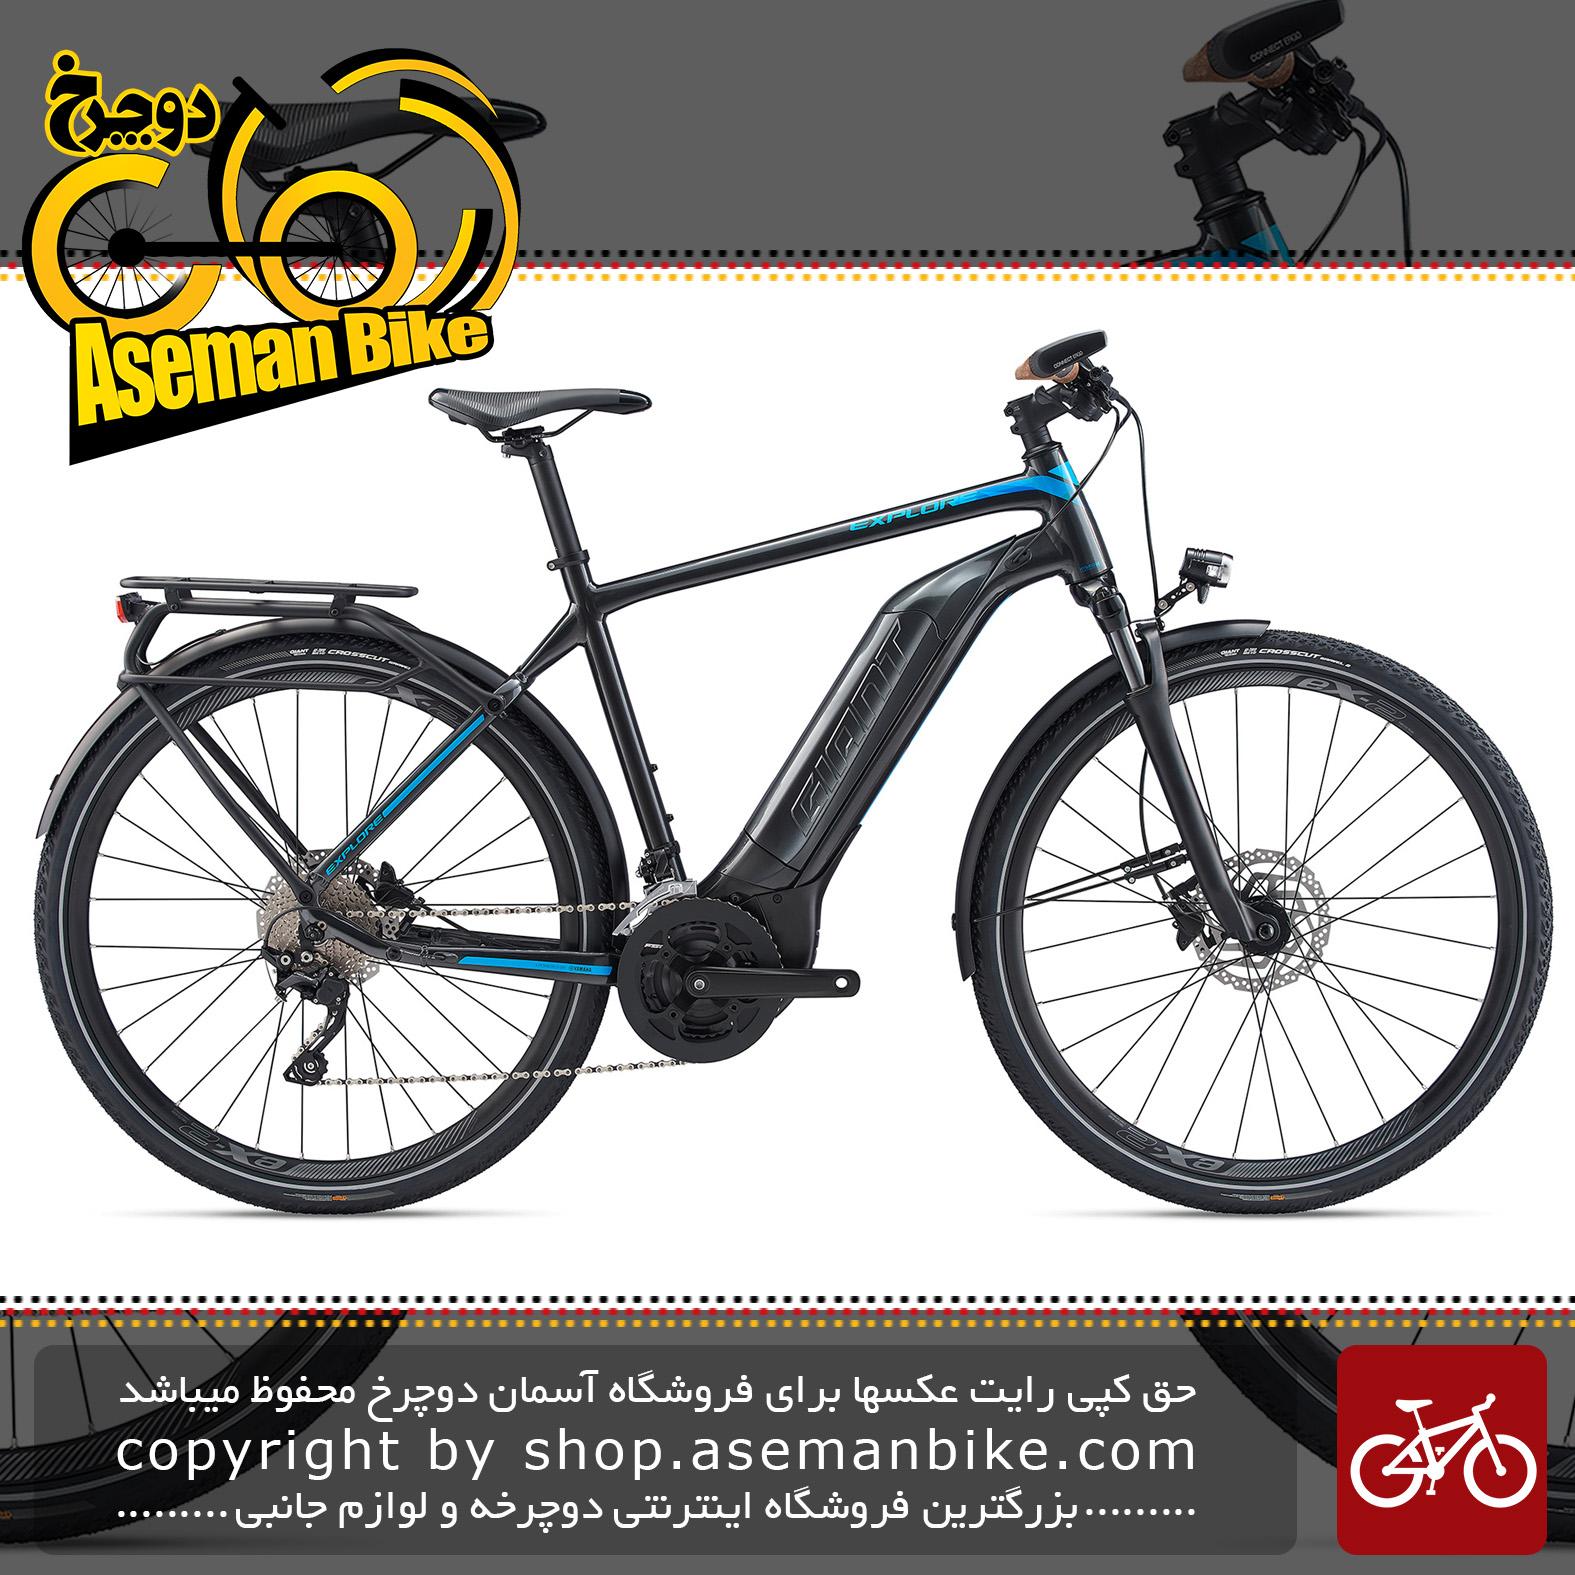 دوچرخه دومنظوره برقی جاینت مدل اکسپلور ای پلاس 1 جی تی اس 2020 Giant Trekking Bicycle Explore E+ 1 GTS 2020